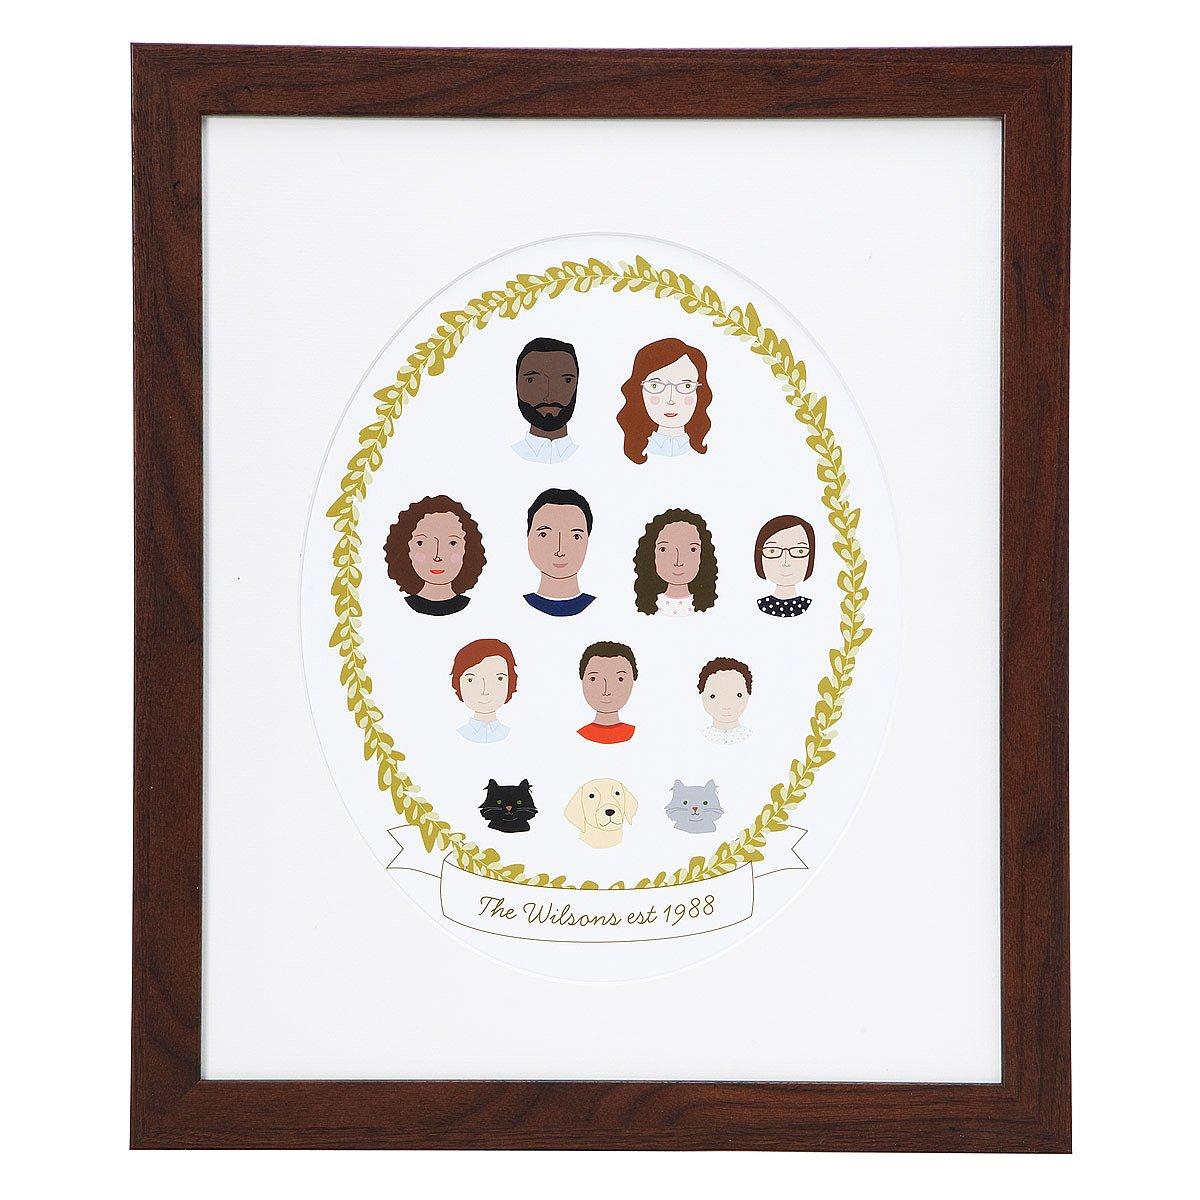 Personalized family cameo portrait portrait drawings uncommongoods personalized family cameo portrait 1 thumbnail jeuxipadfo Choice Image